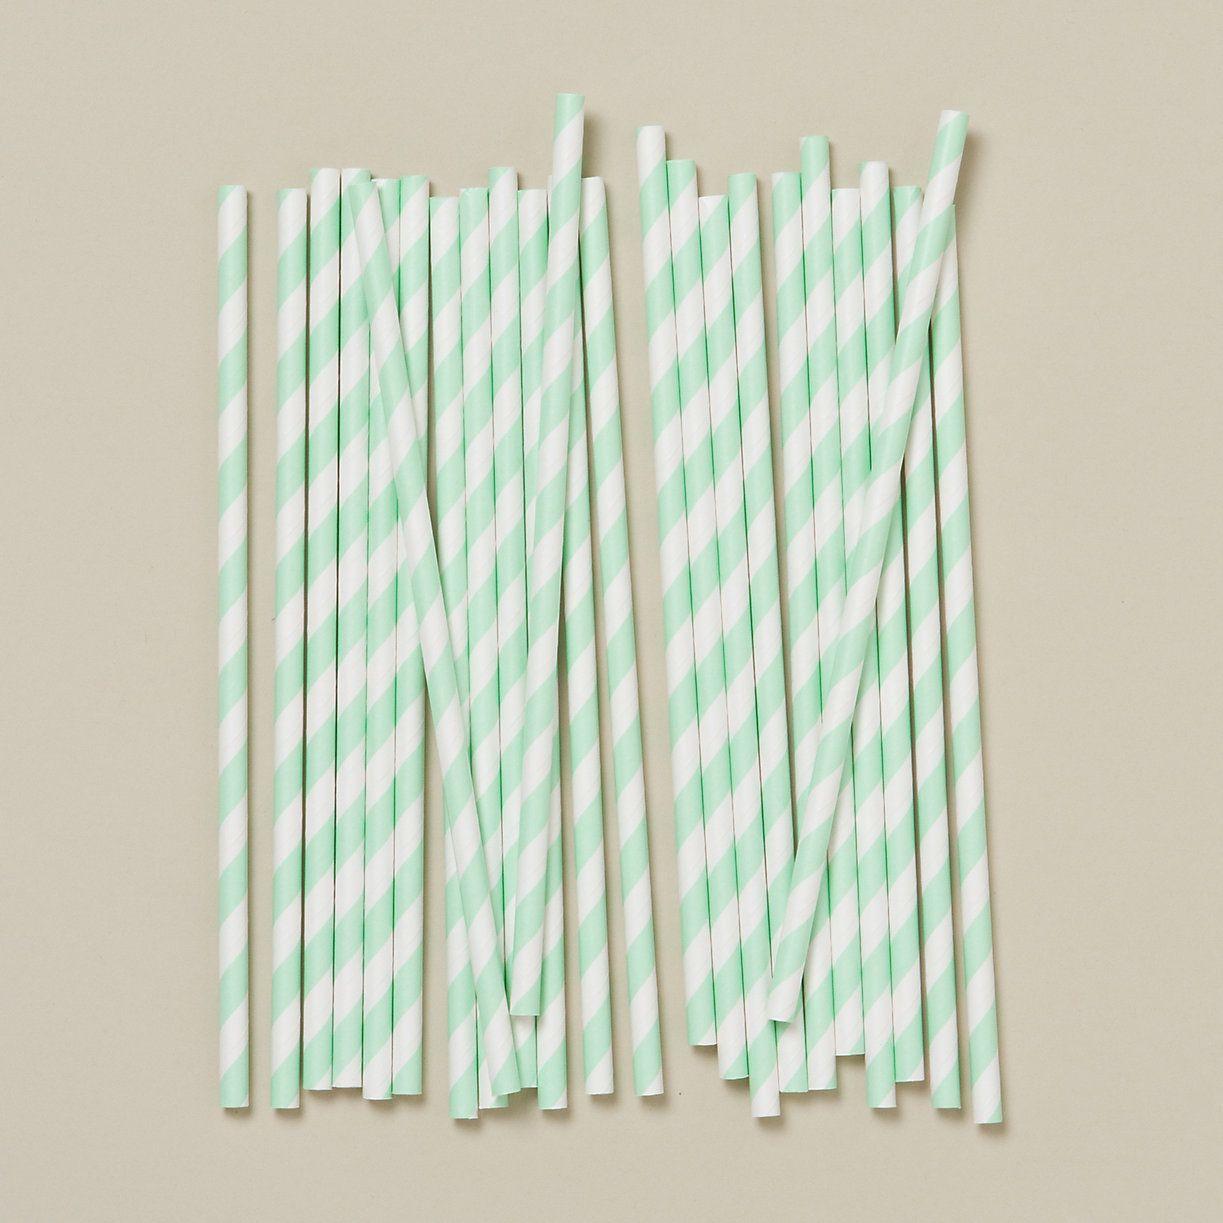 Soda Fountain Straws in House + Home Gadgets + Novelties at Terrain